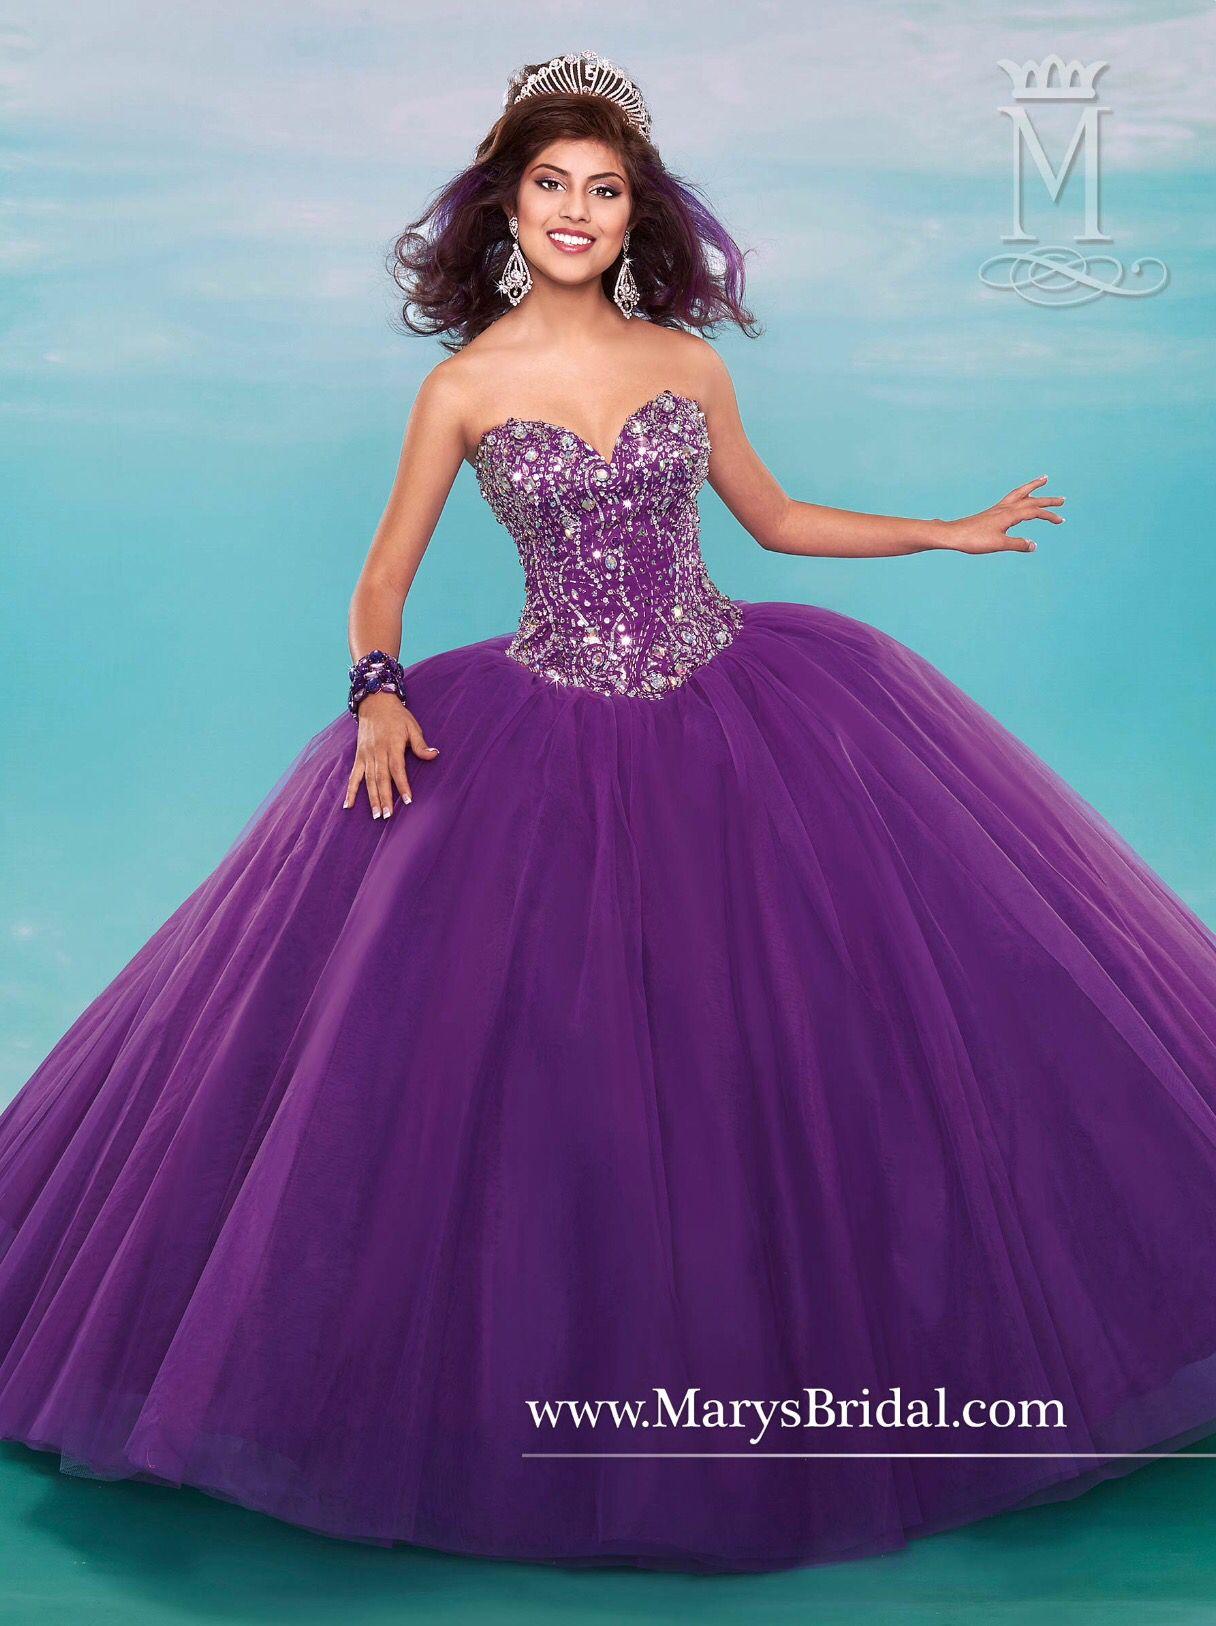 Purple dress | Patrones Antiguos | Pinterest | Patrones antiguos y ...